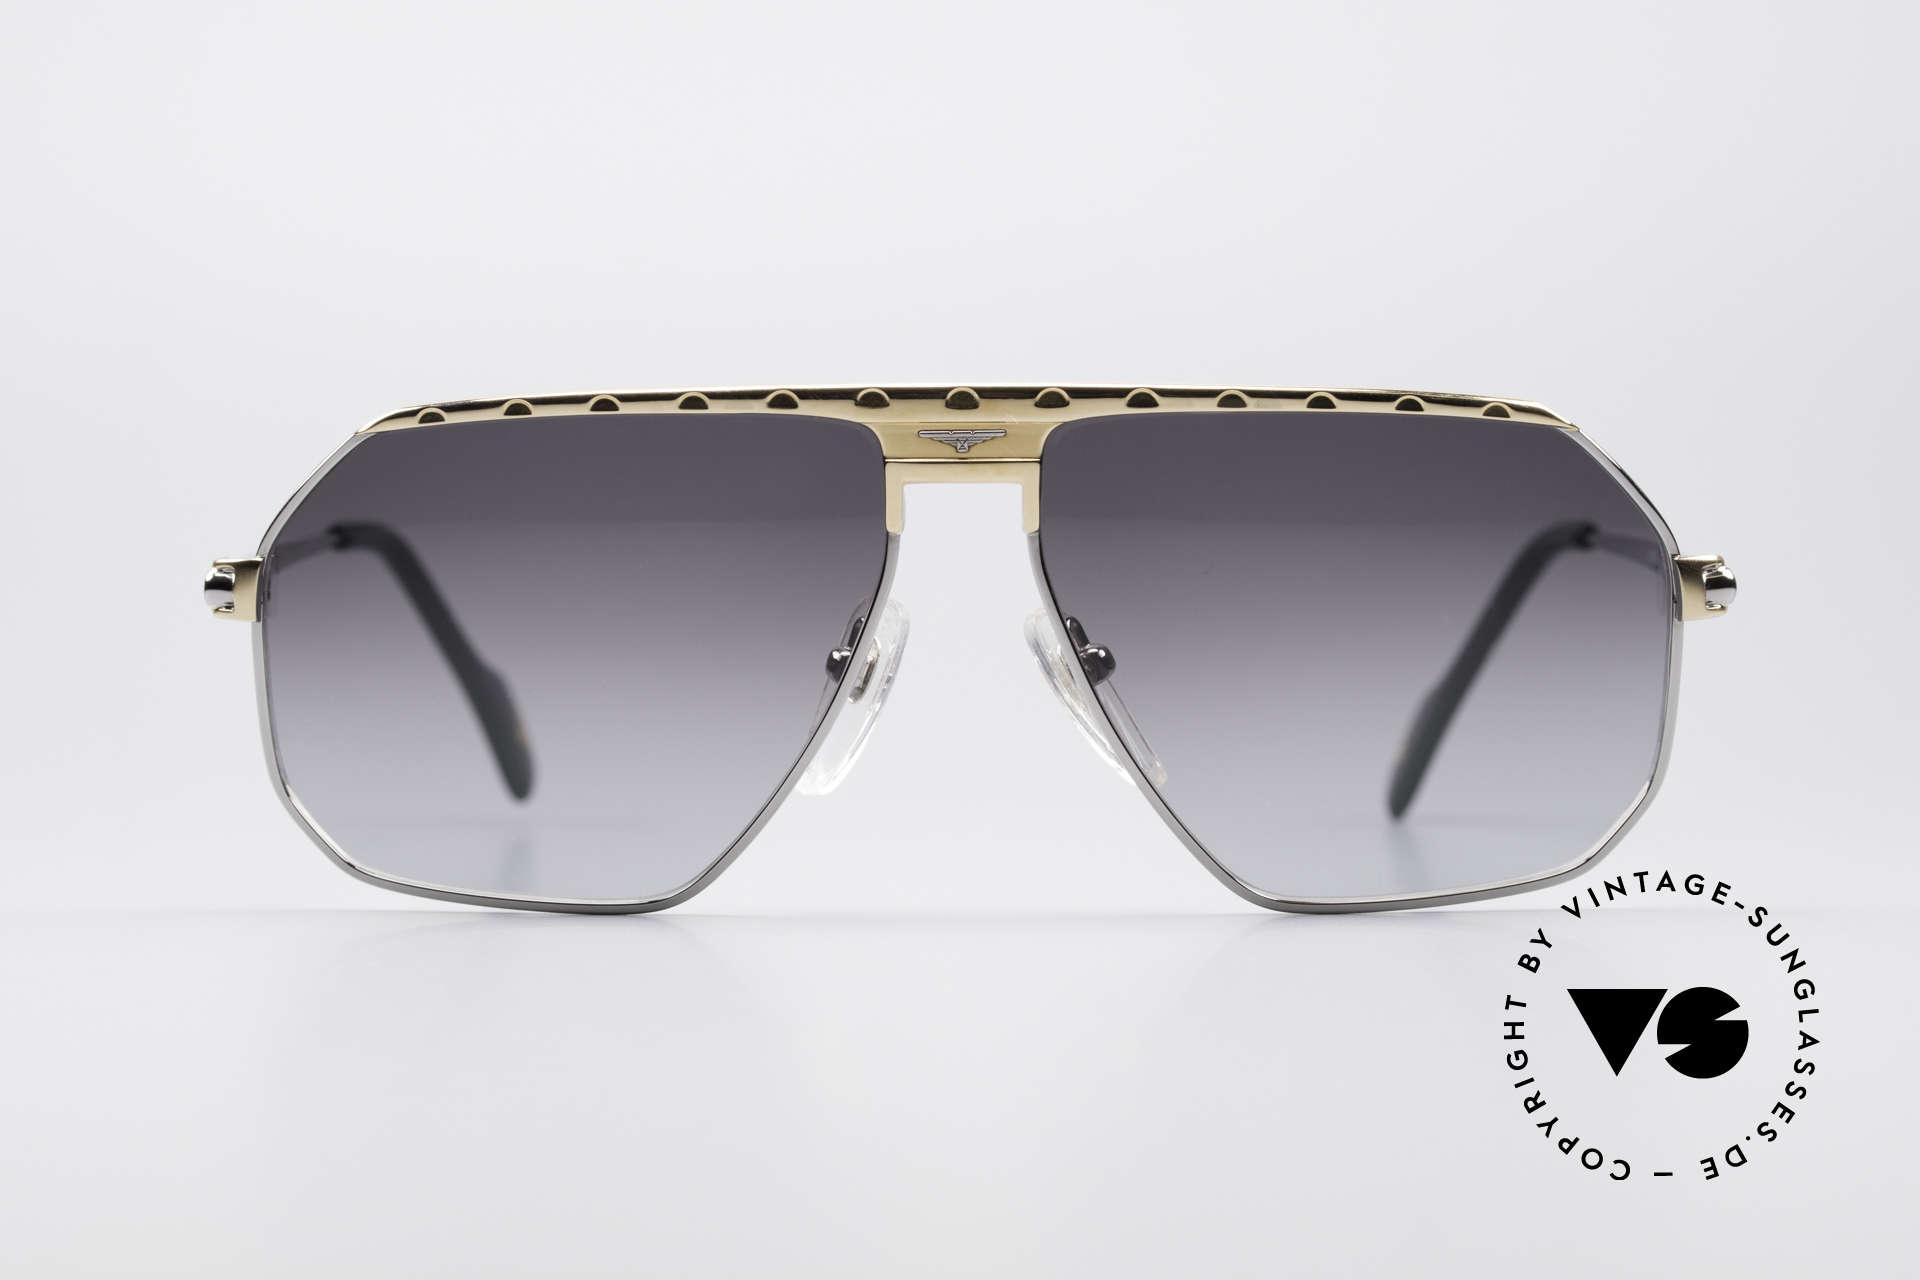 Longines 0152 Rare 80's Titanium Sunglasses, high-class craftsmanship & very masculine design, Made for Men